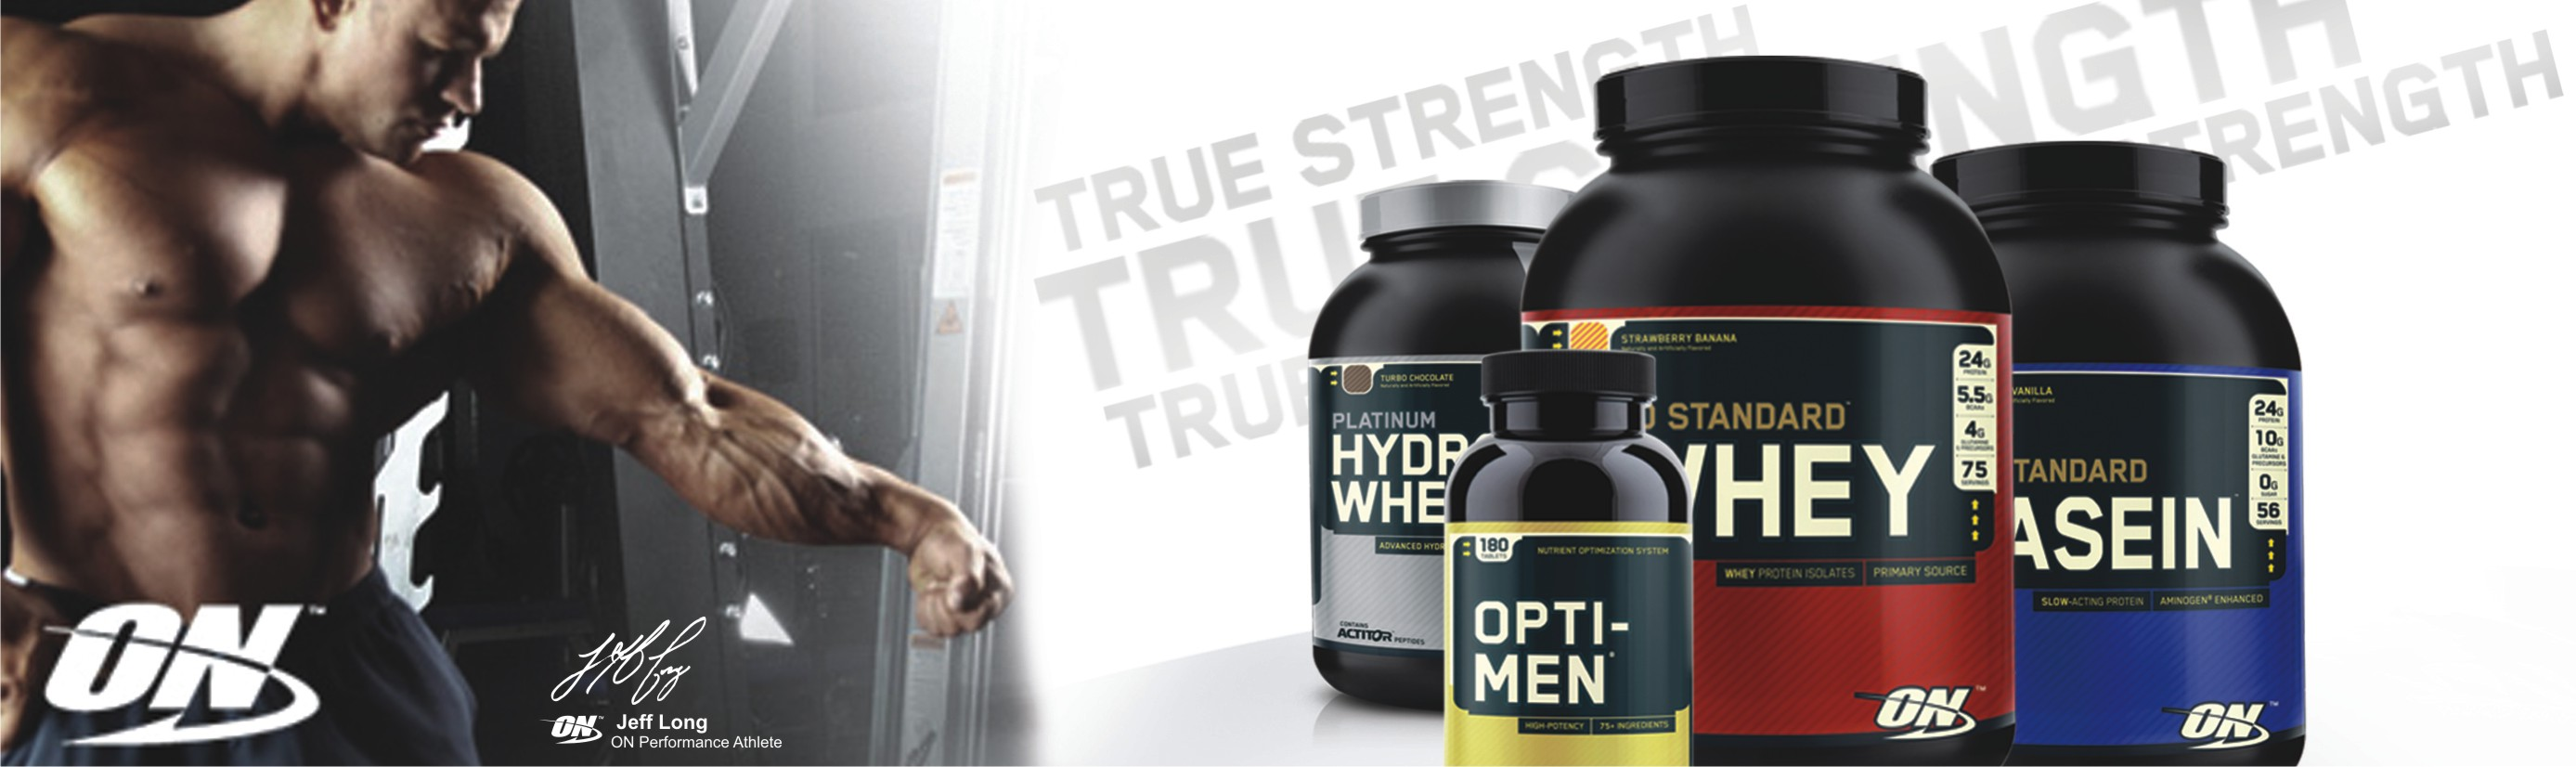 Shop Optimum Nutrition Supplements at OptimalNutrition.com